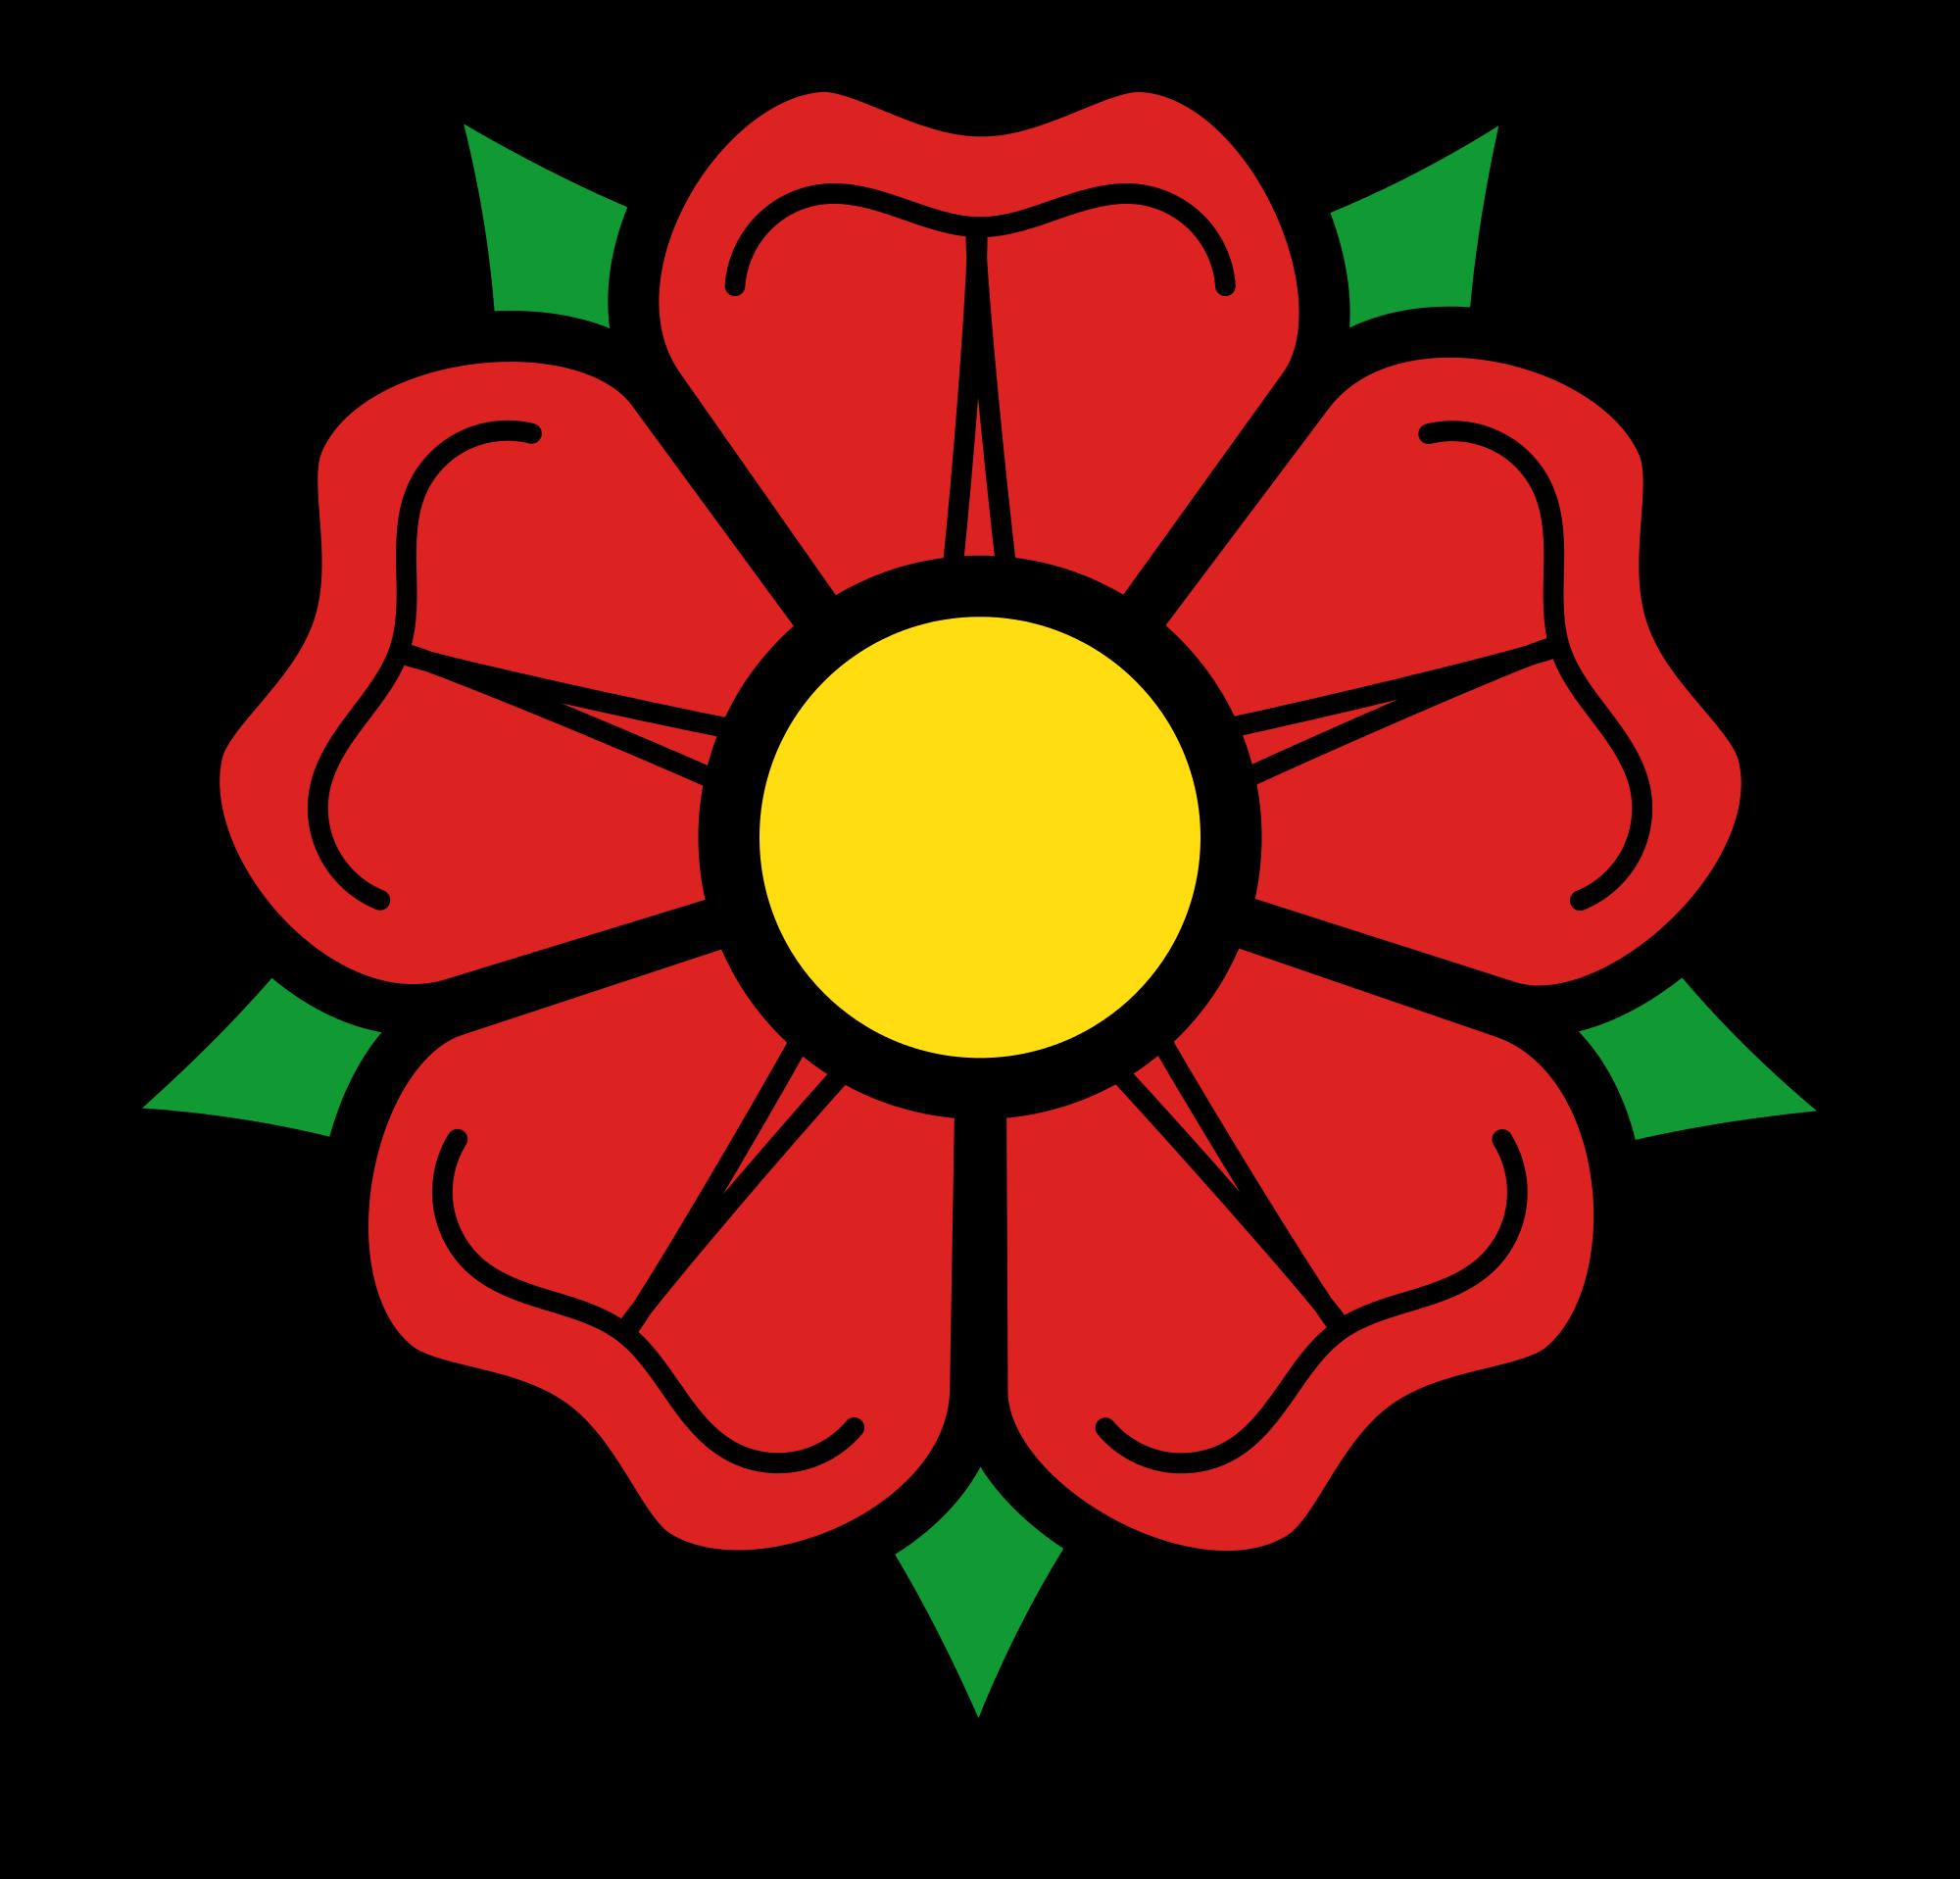 Clipart rose english rose. File heraldique svg wikimedia